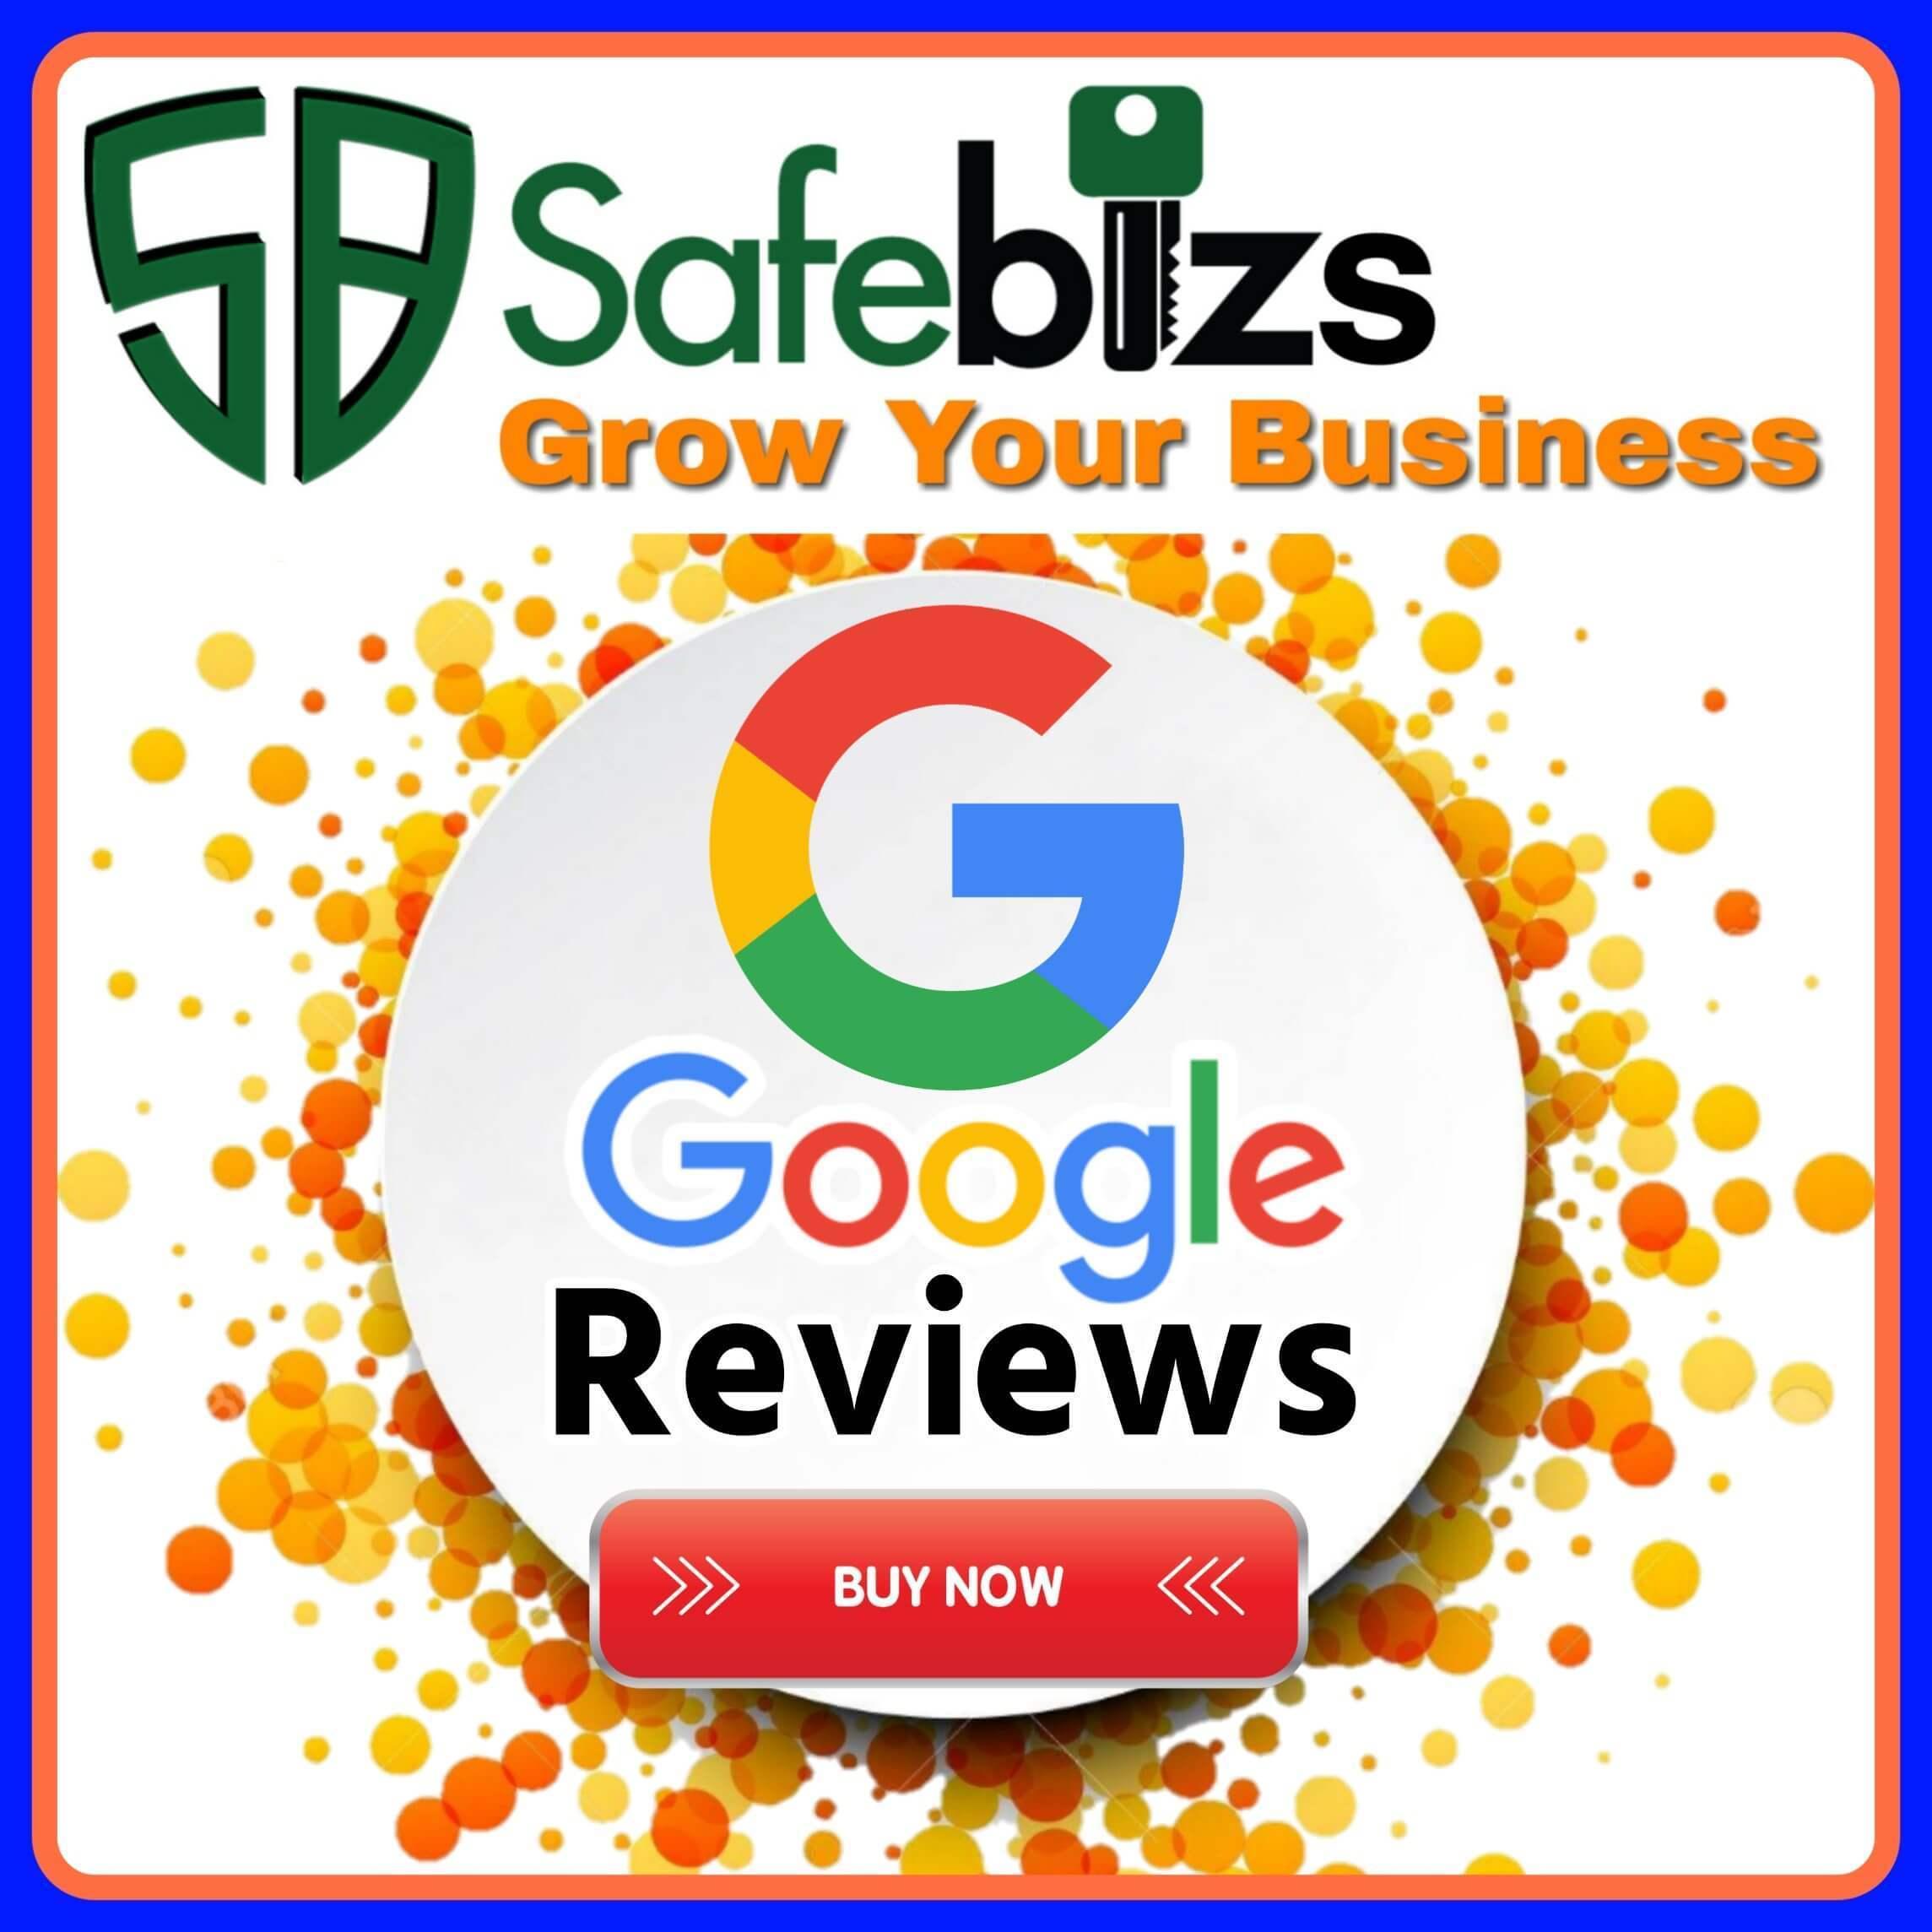 Buy Google Reviews - Google 5 Star Reviews